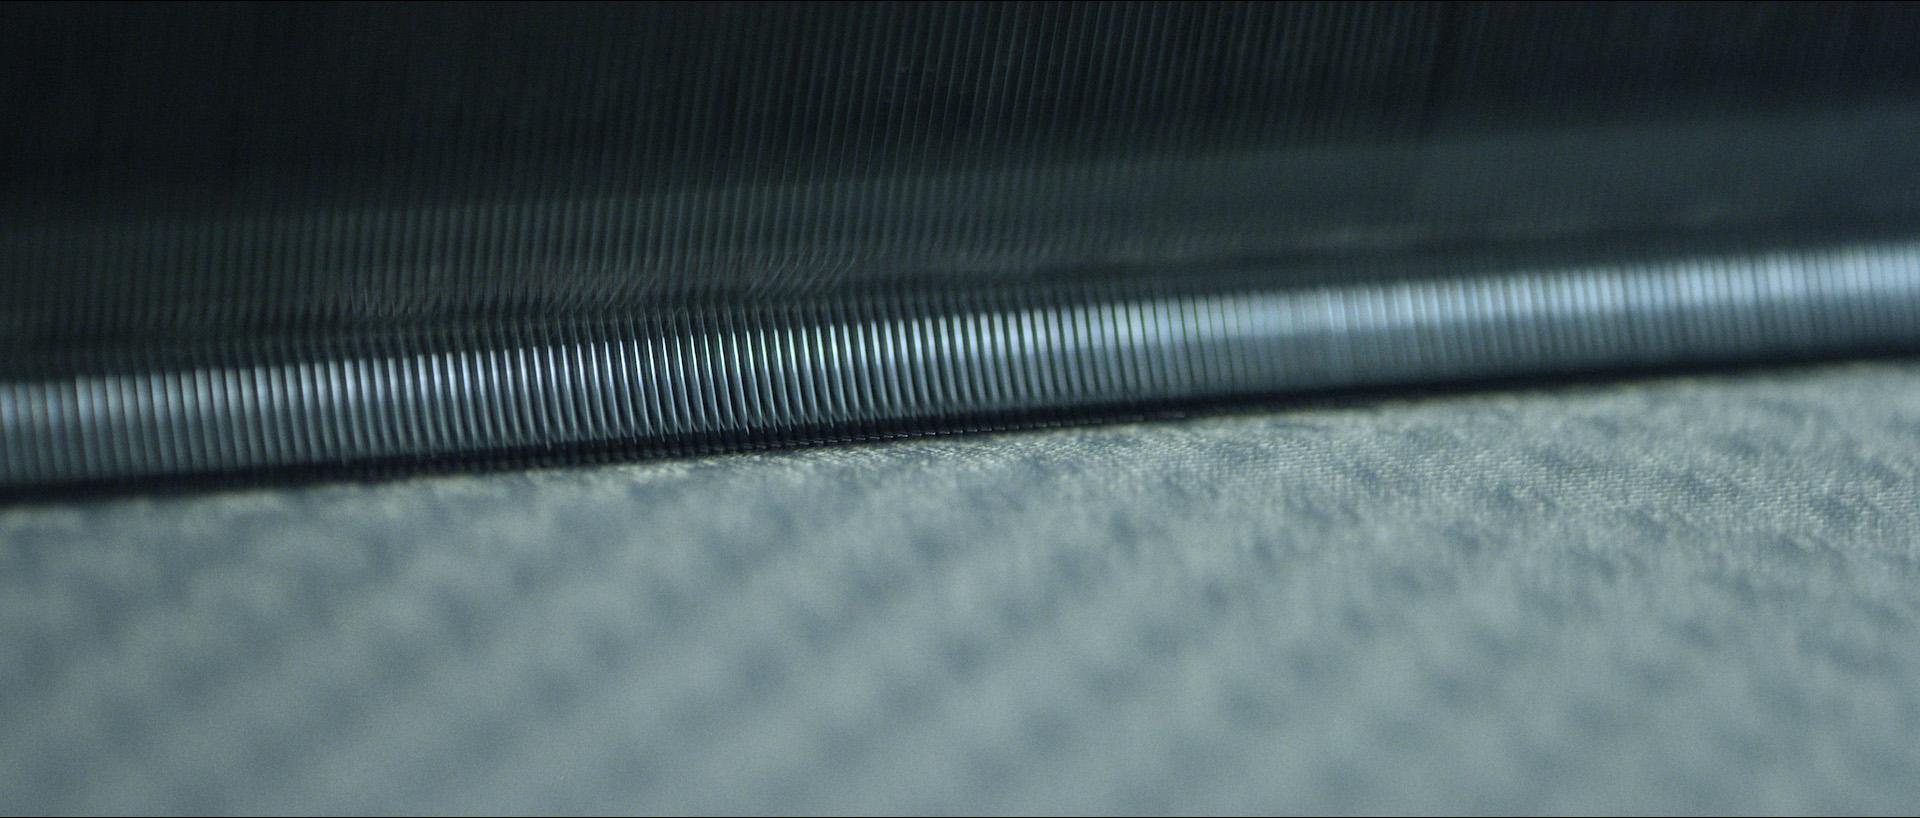 Karl-Mayer-Texture-Machine-Production-Textile_09.jpg